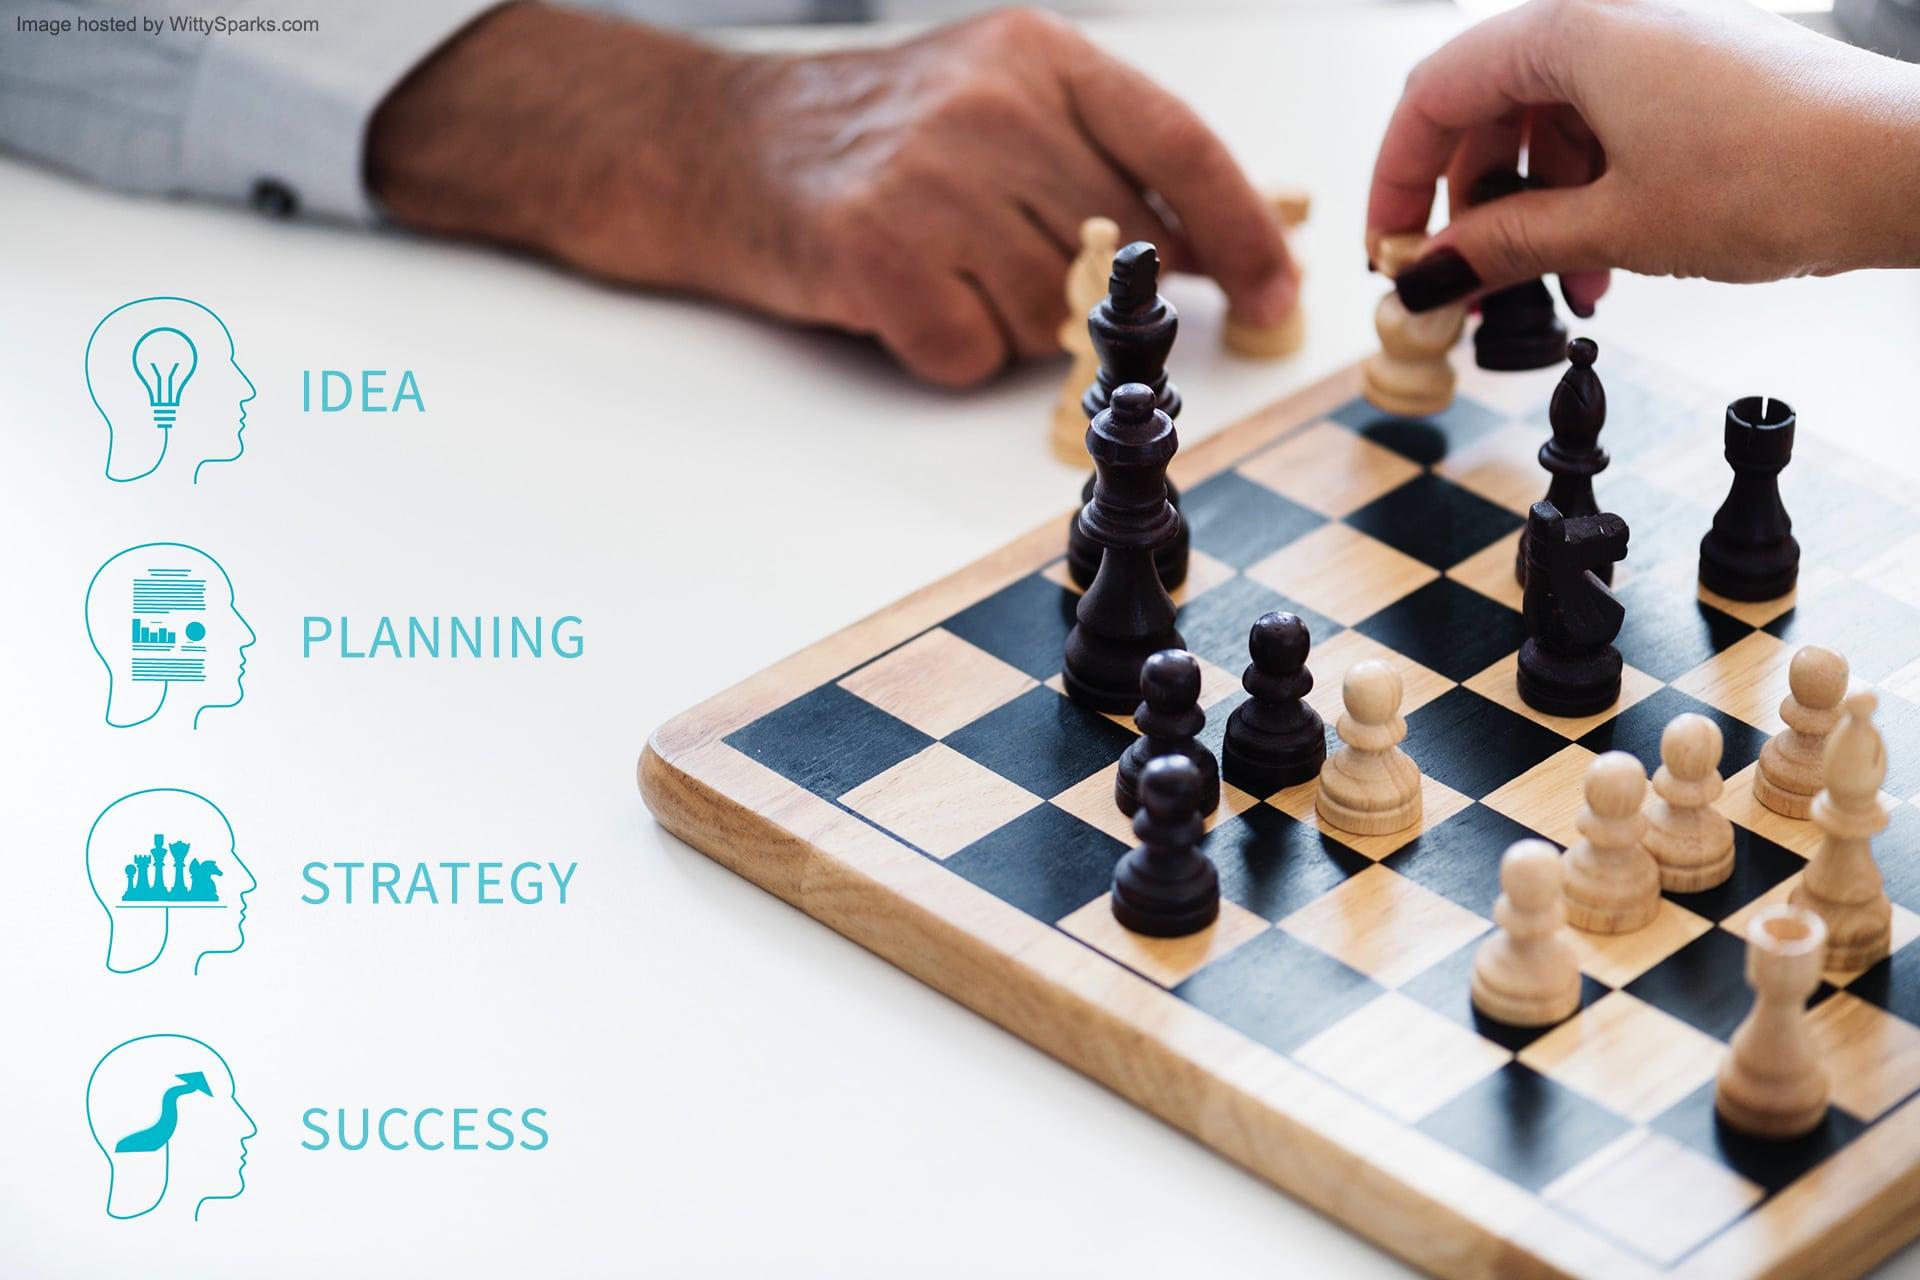 Entrepreneurs - Idea, Planning, Strategy, Success